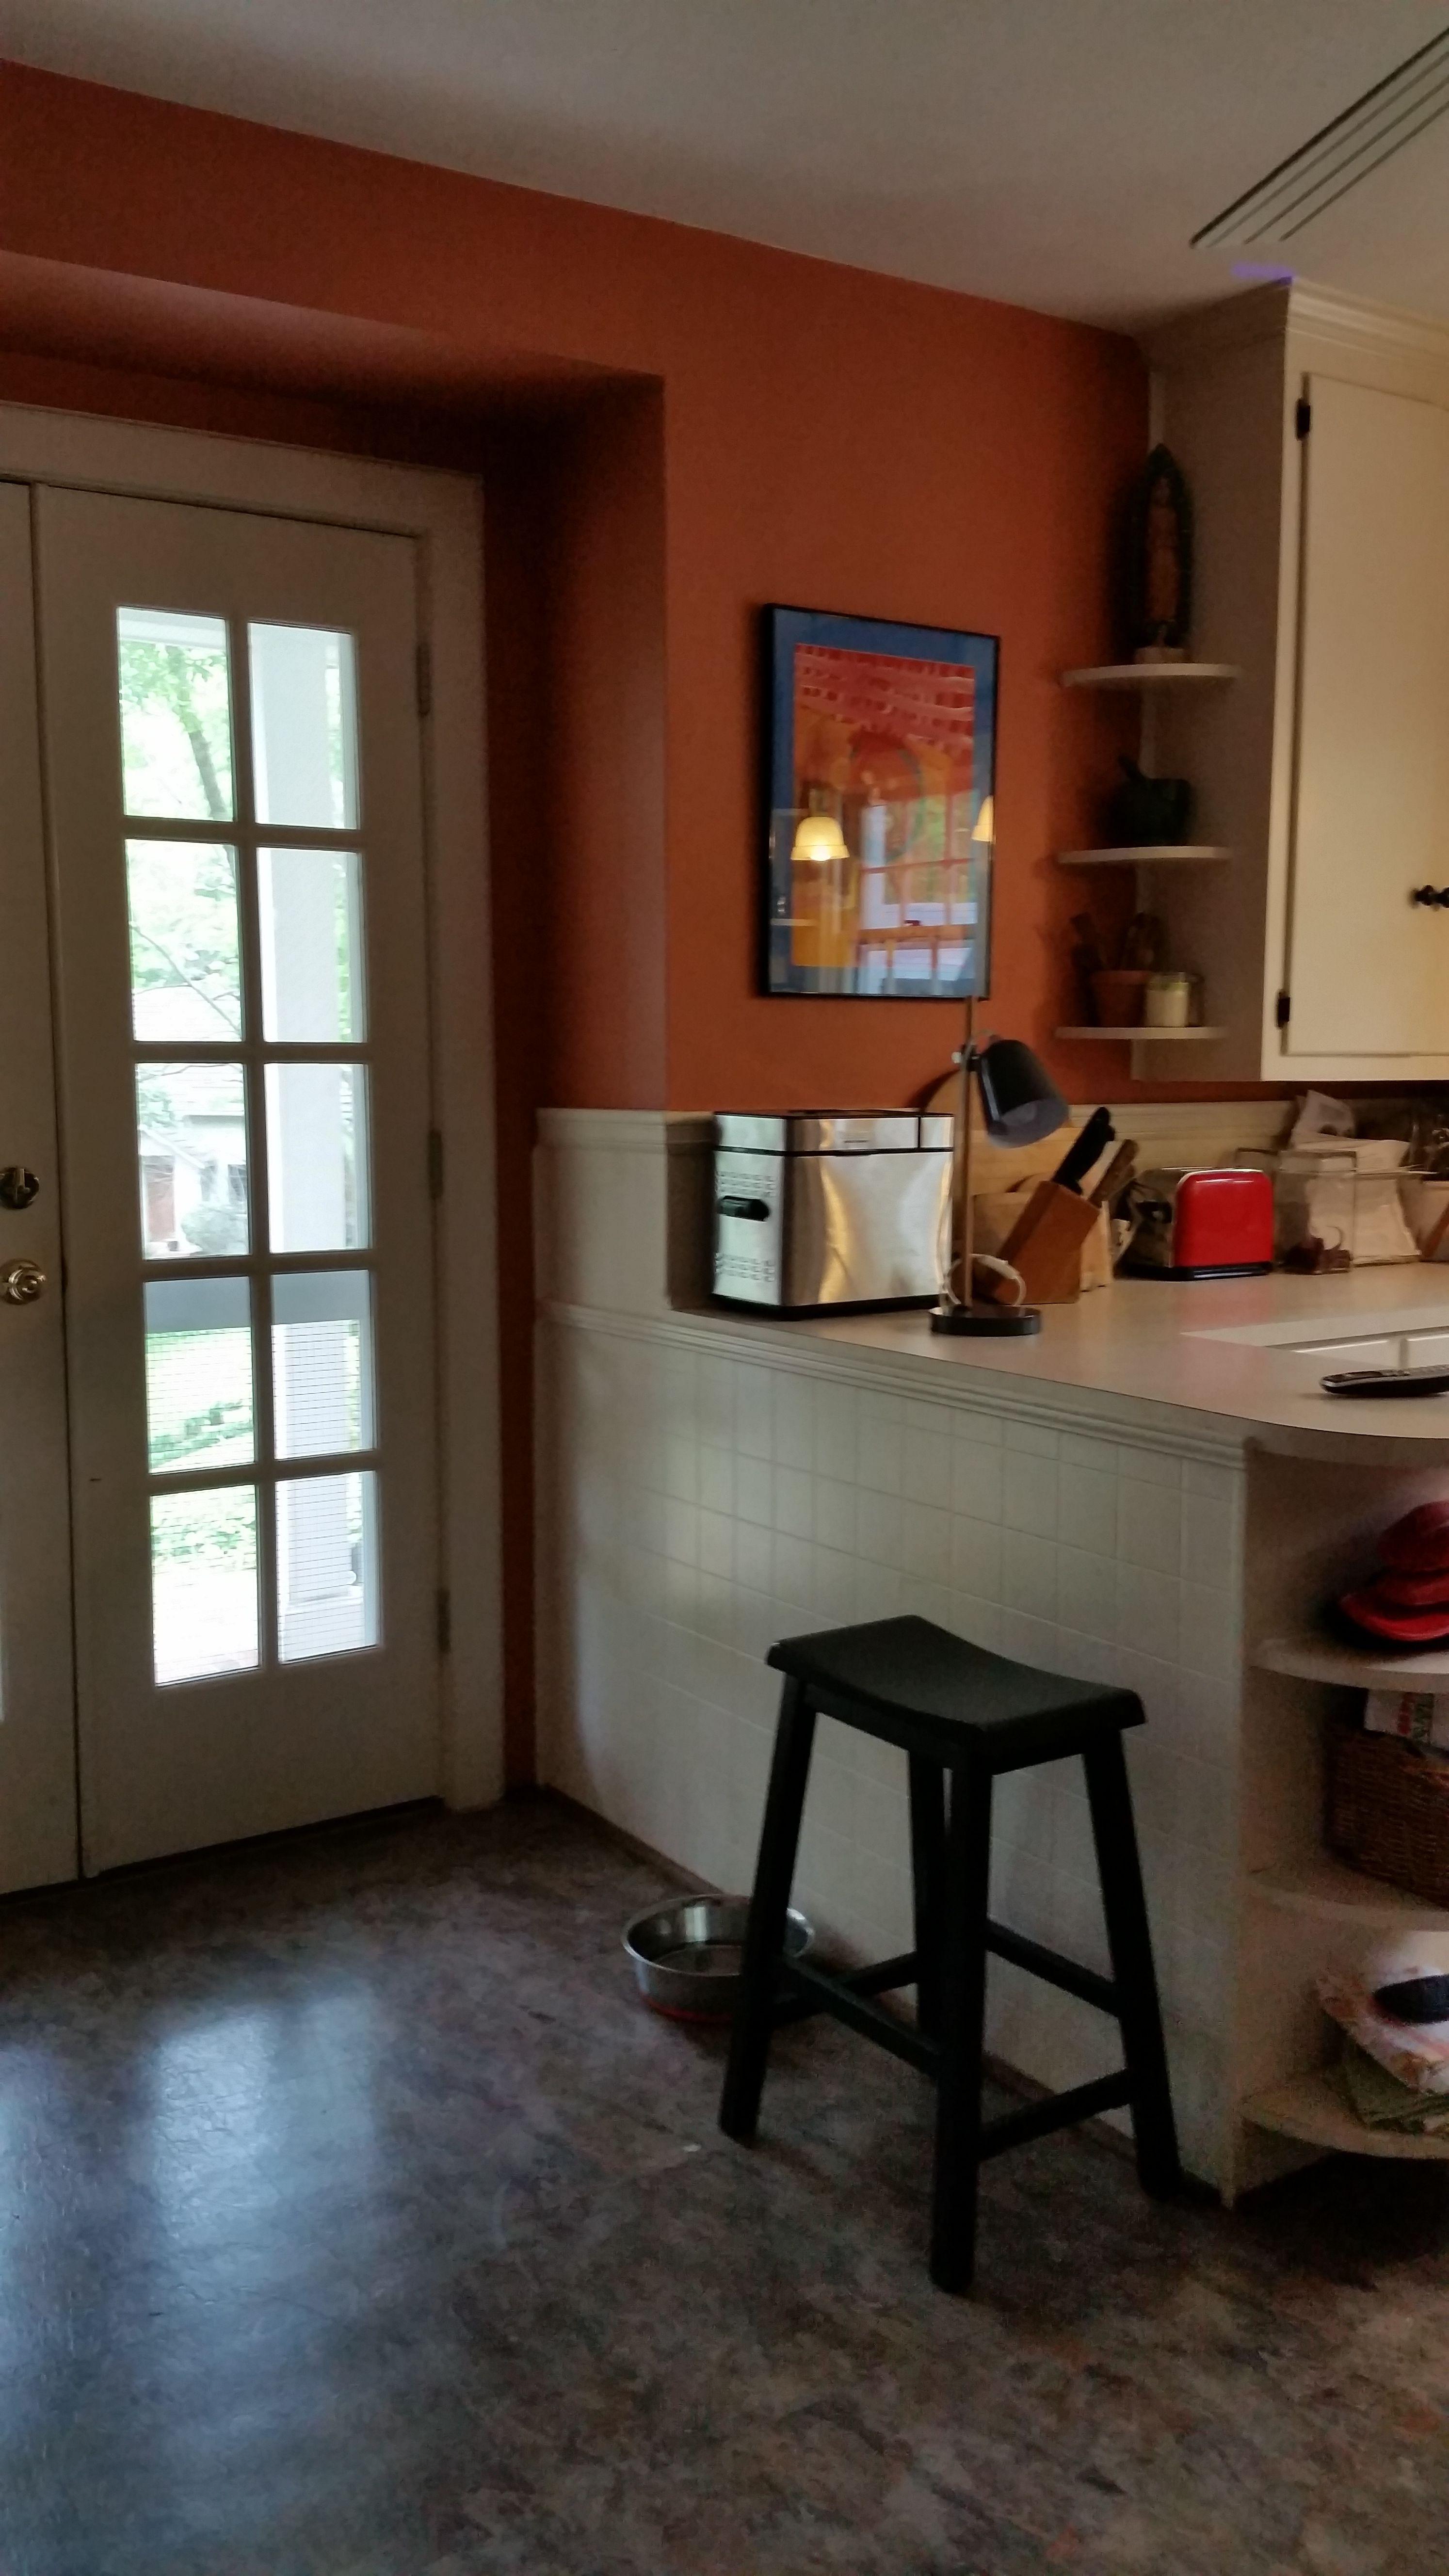 Kitchen living room window  kitchen before  kitchendining reno  pinterest  kitchen dining